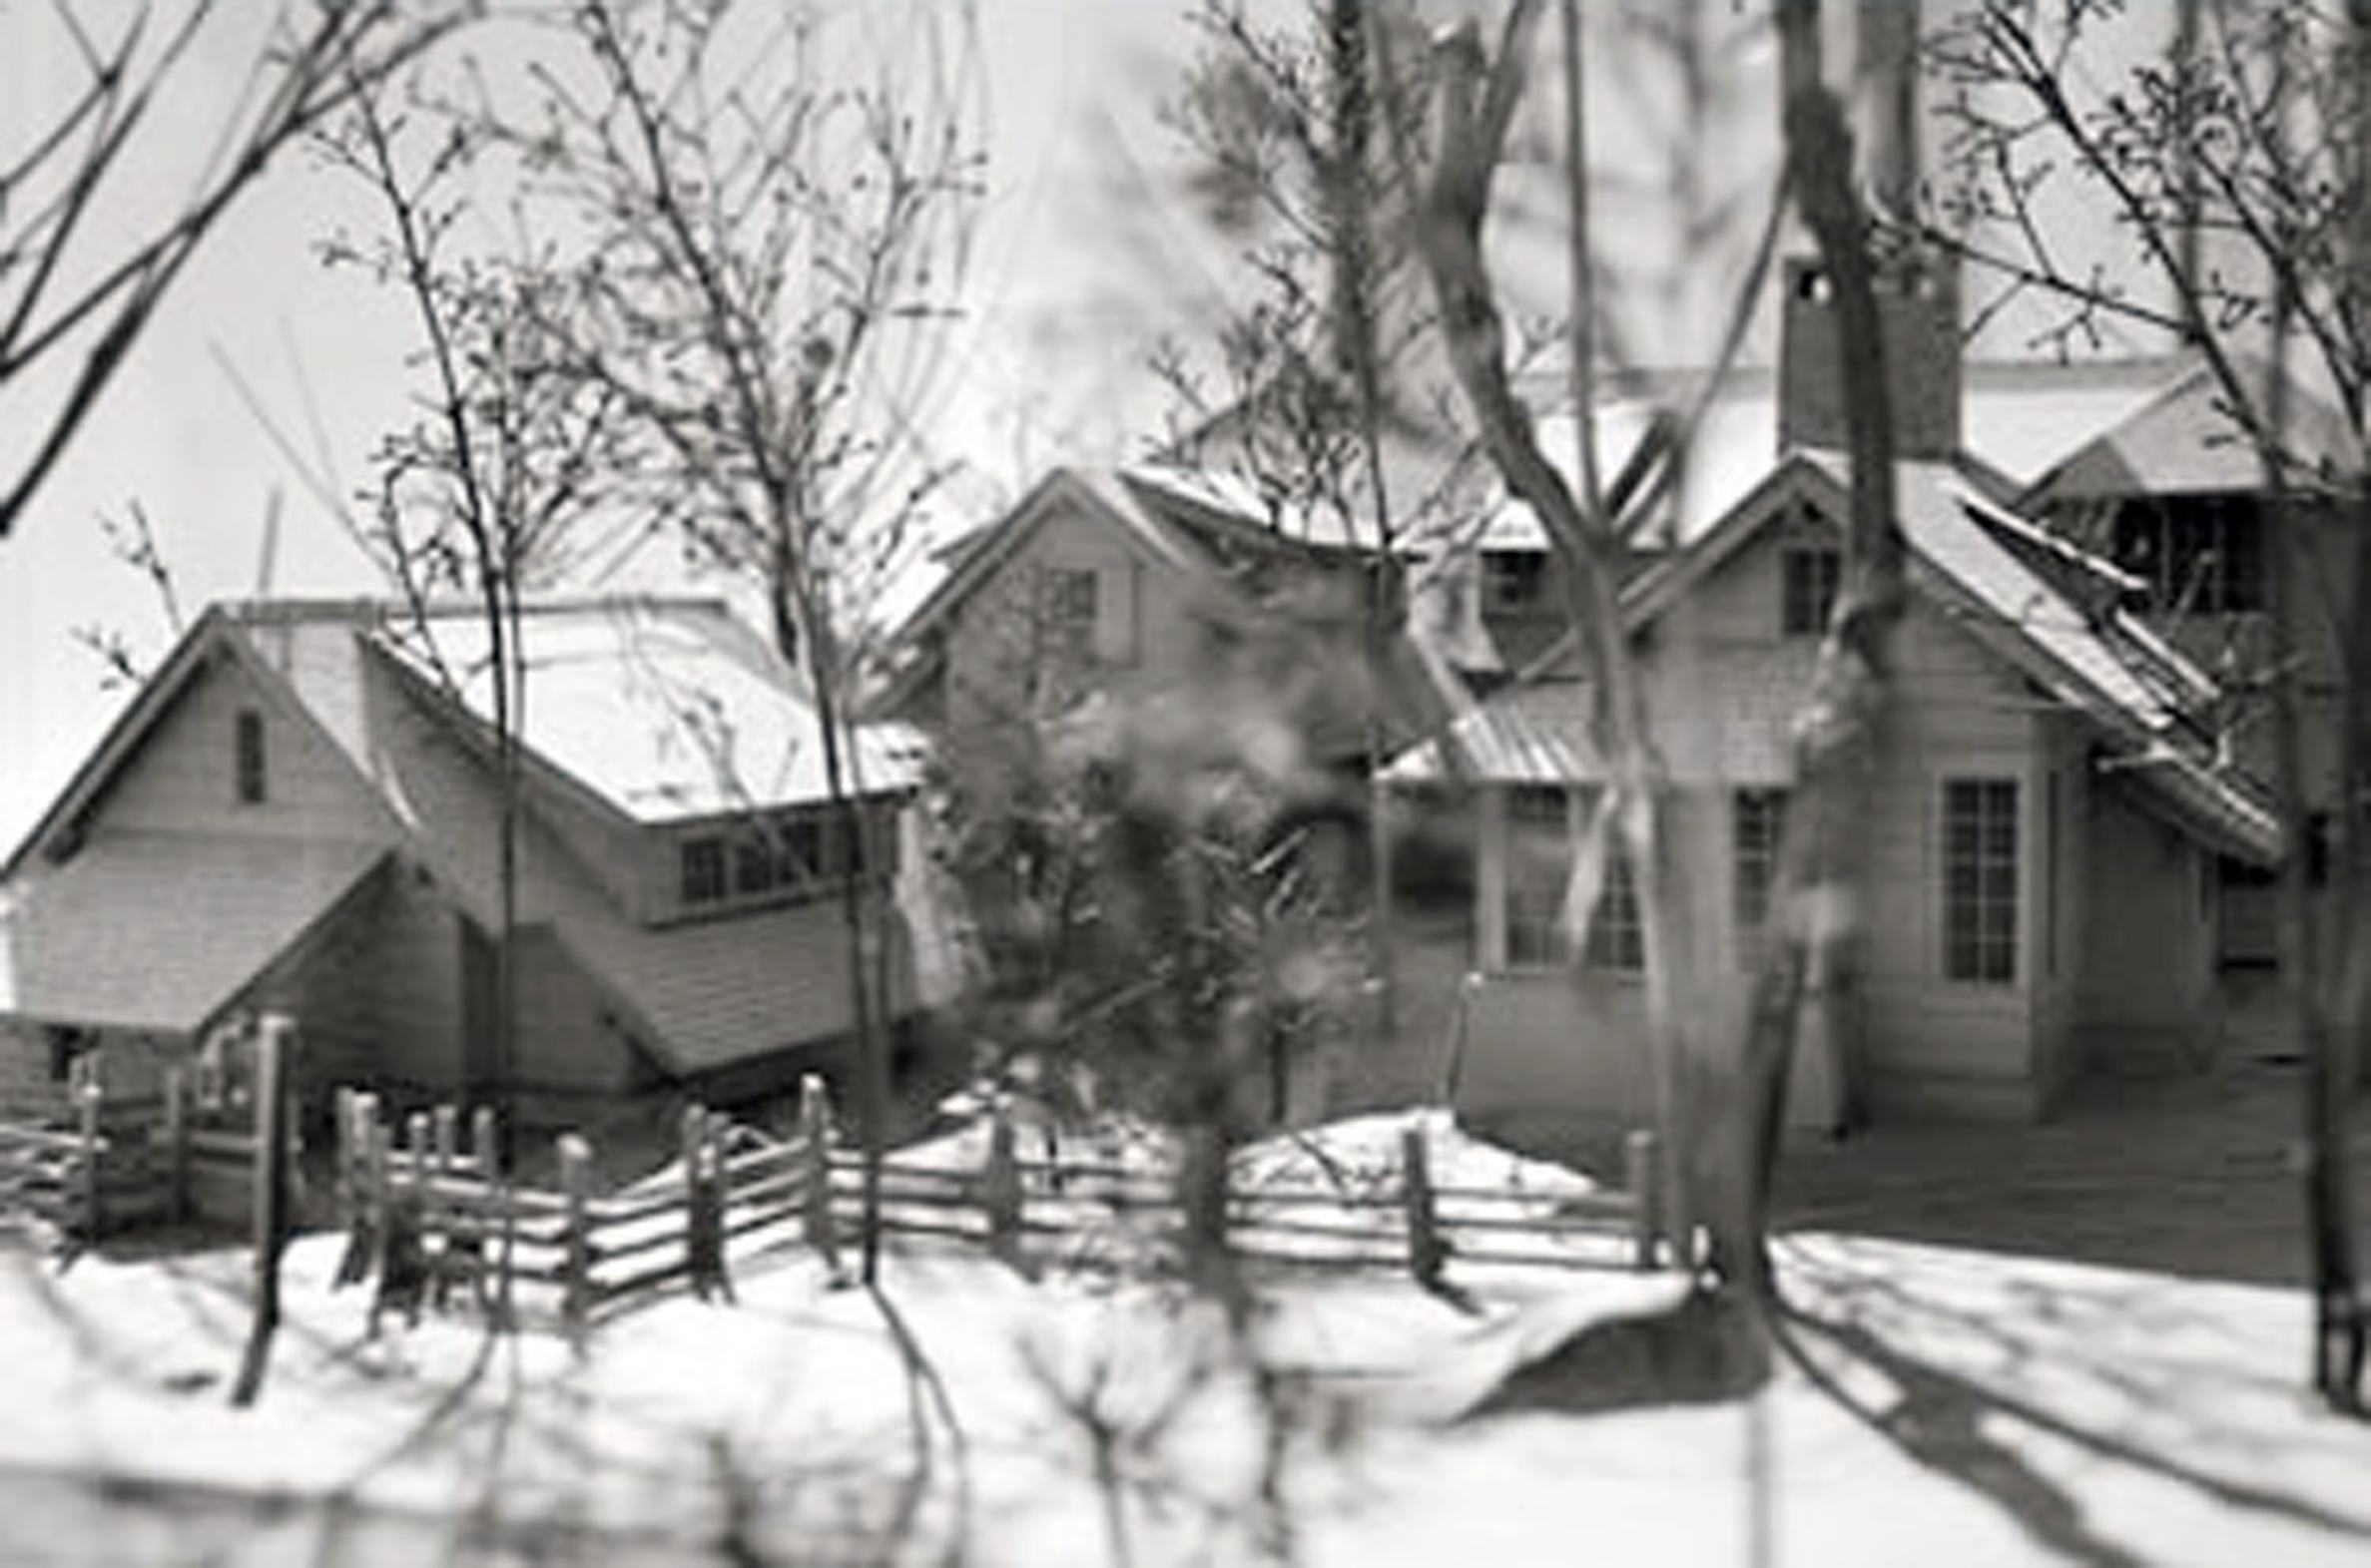 Lake_Placid.New_York.Lake_House.Robert_Orr_&_Associates.Architecture.Landscape_Architecture.Urbanism.Camp.Model2.Pursley_Dixon.jpg